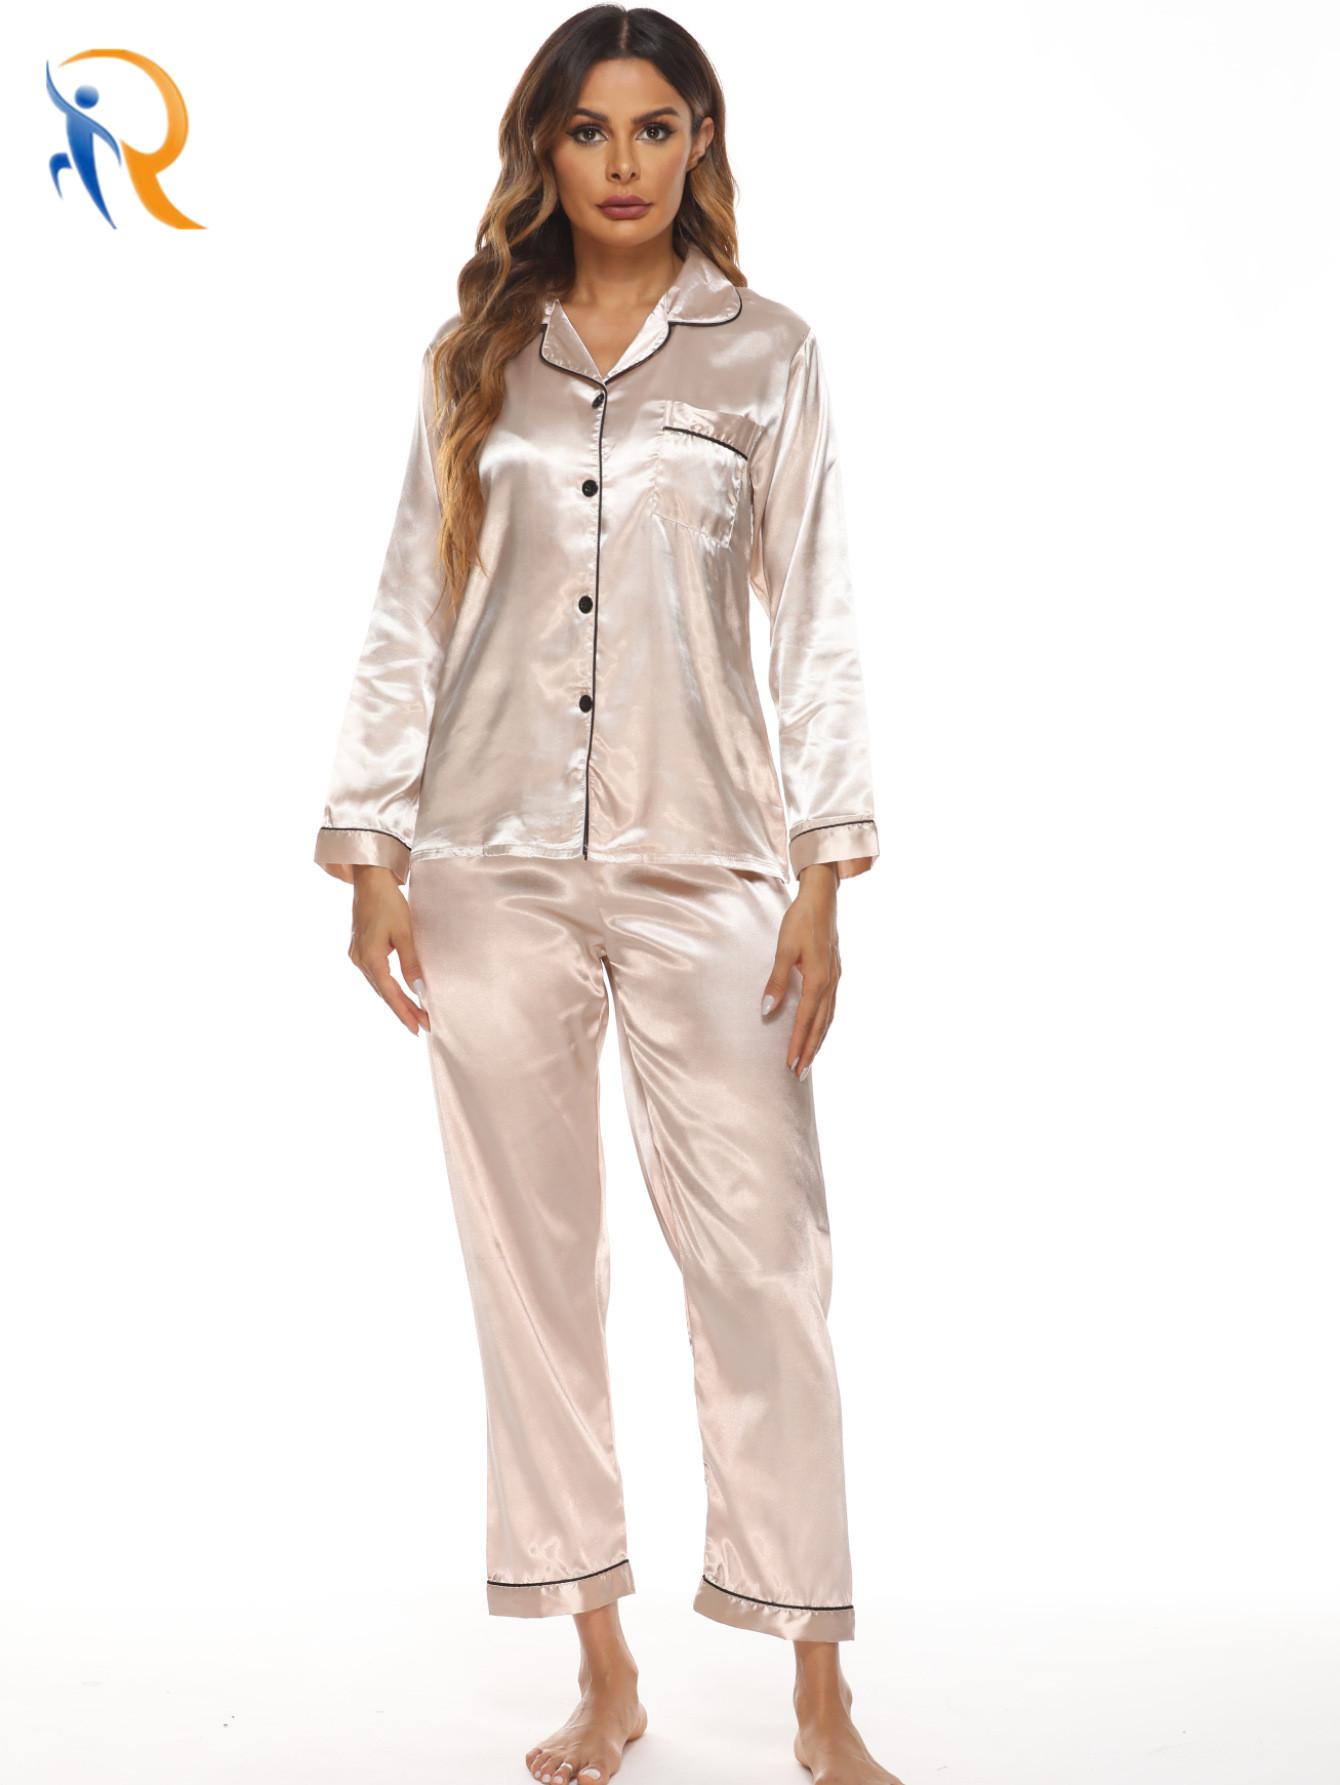 product-Ruiteng-Comfy Womens Cotton Soft Hand Feel Pajamas Set-img